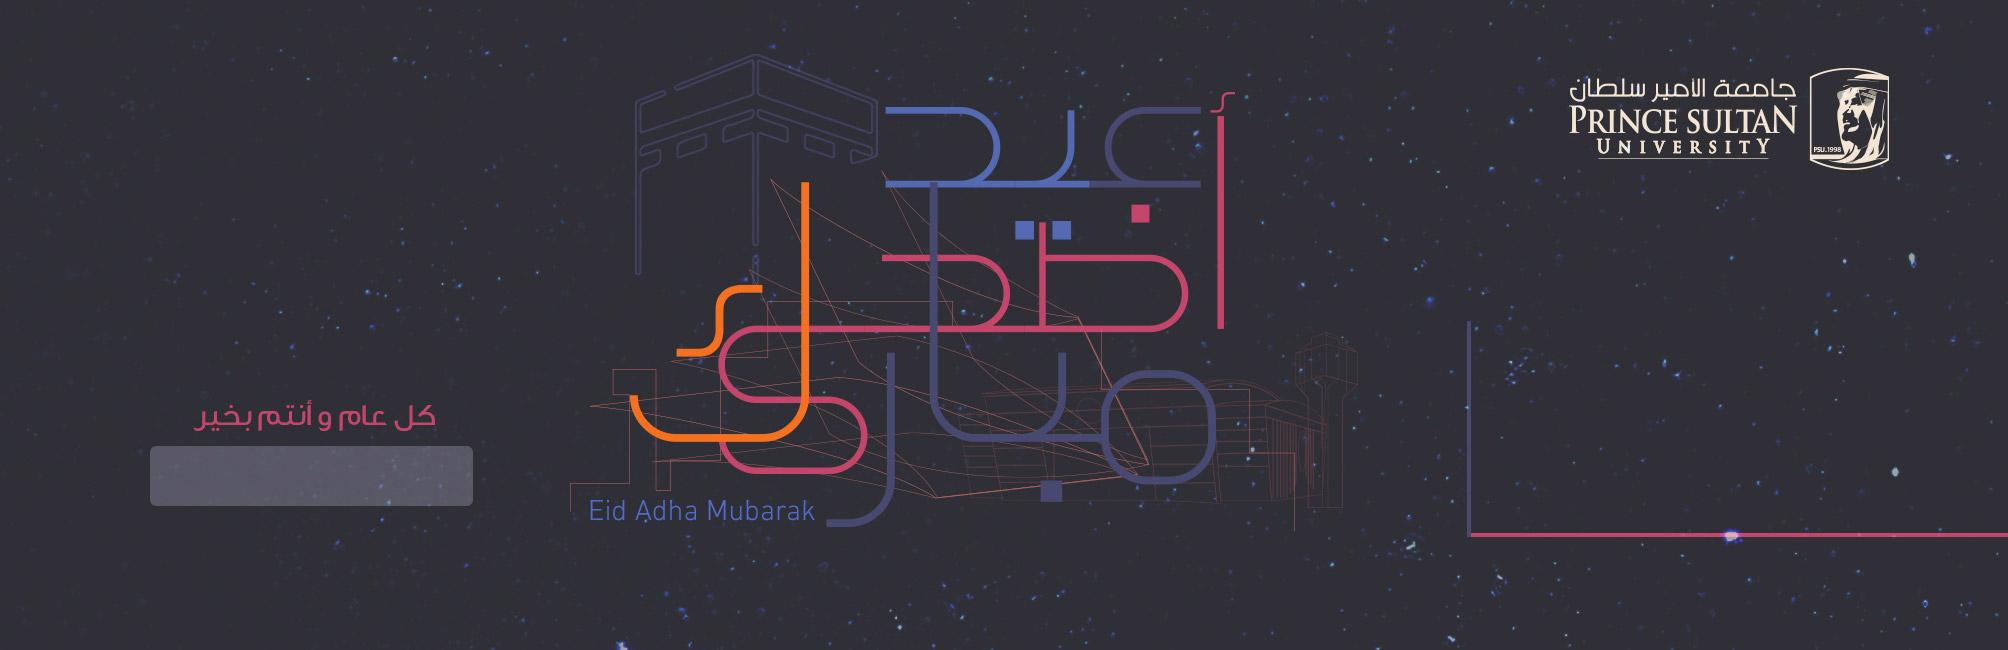 Eid Al-Adha Greetings